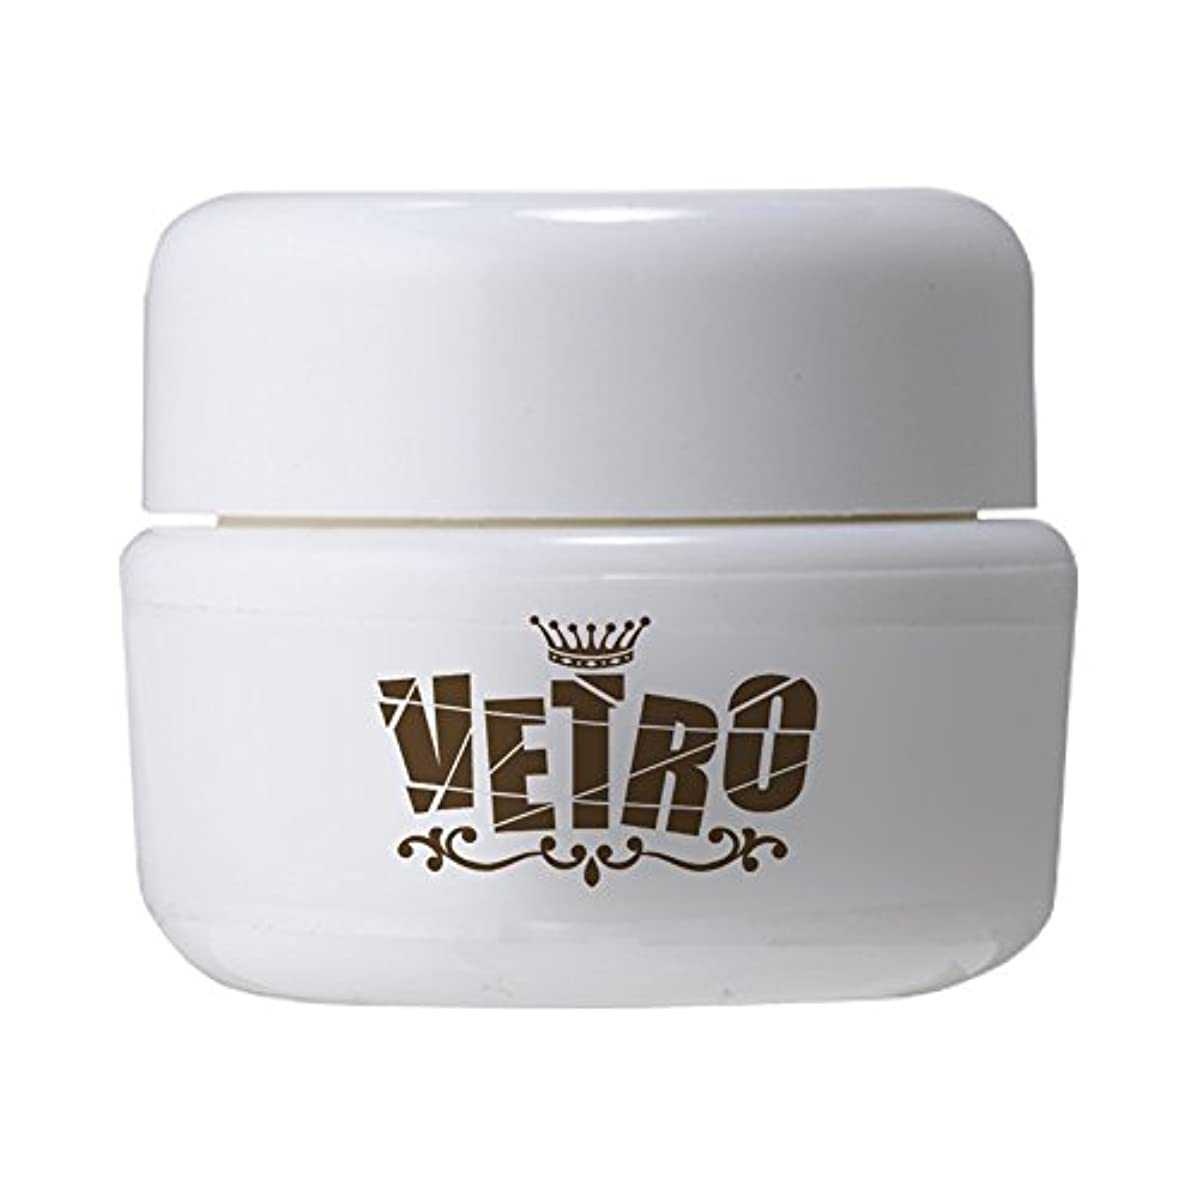 VETRO No.19 カラージェル マット VL368 シオン 4ml